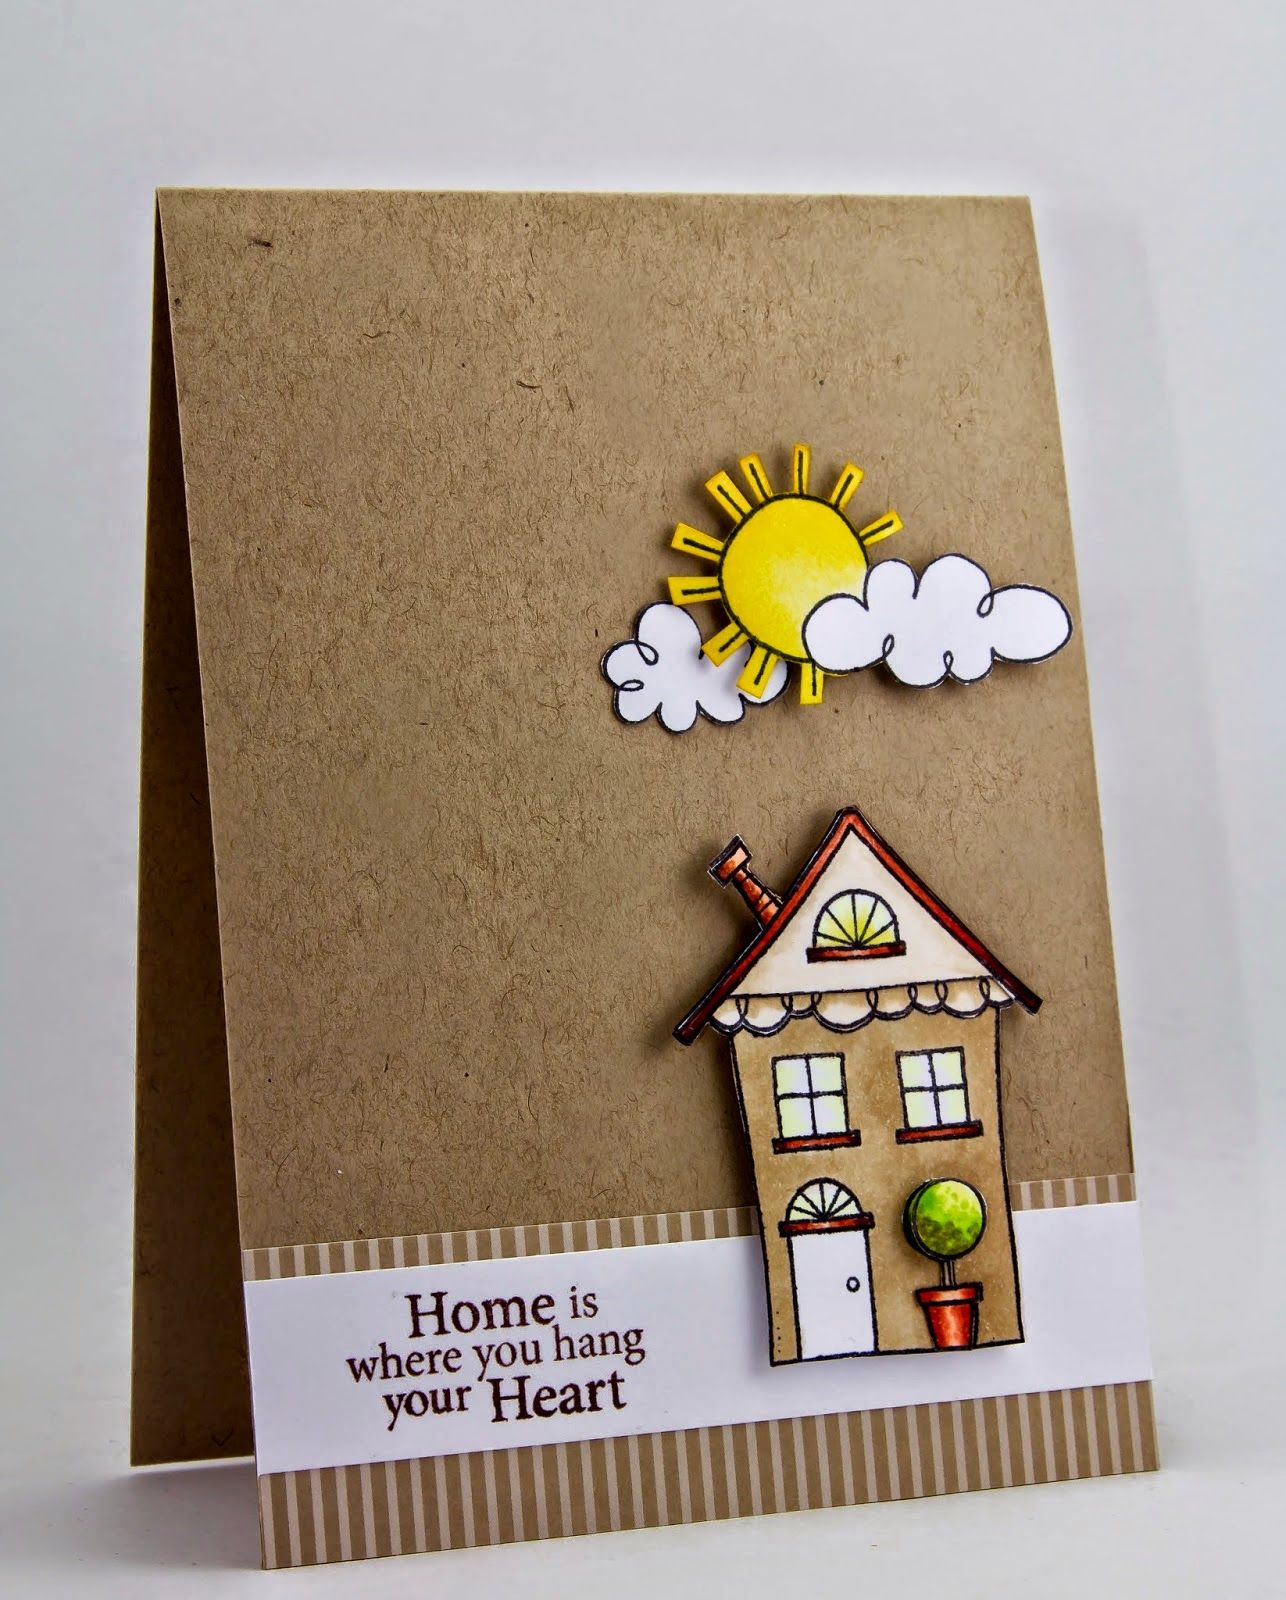 Home Sweet Home Creative Card Making Ideas Cards Handmade Creative Cards